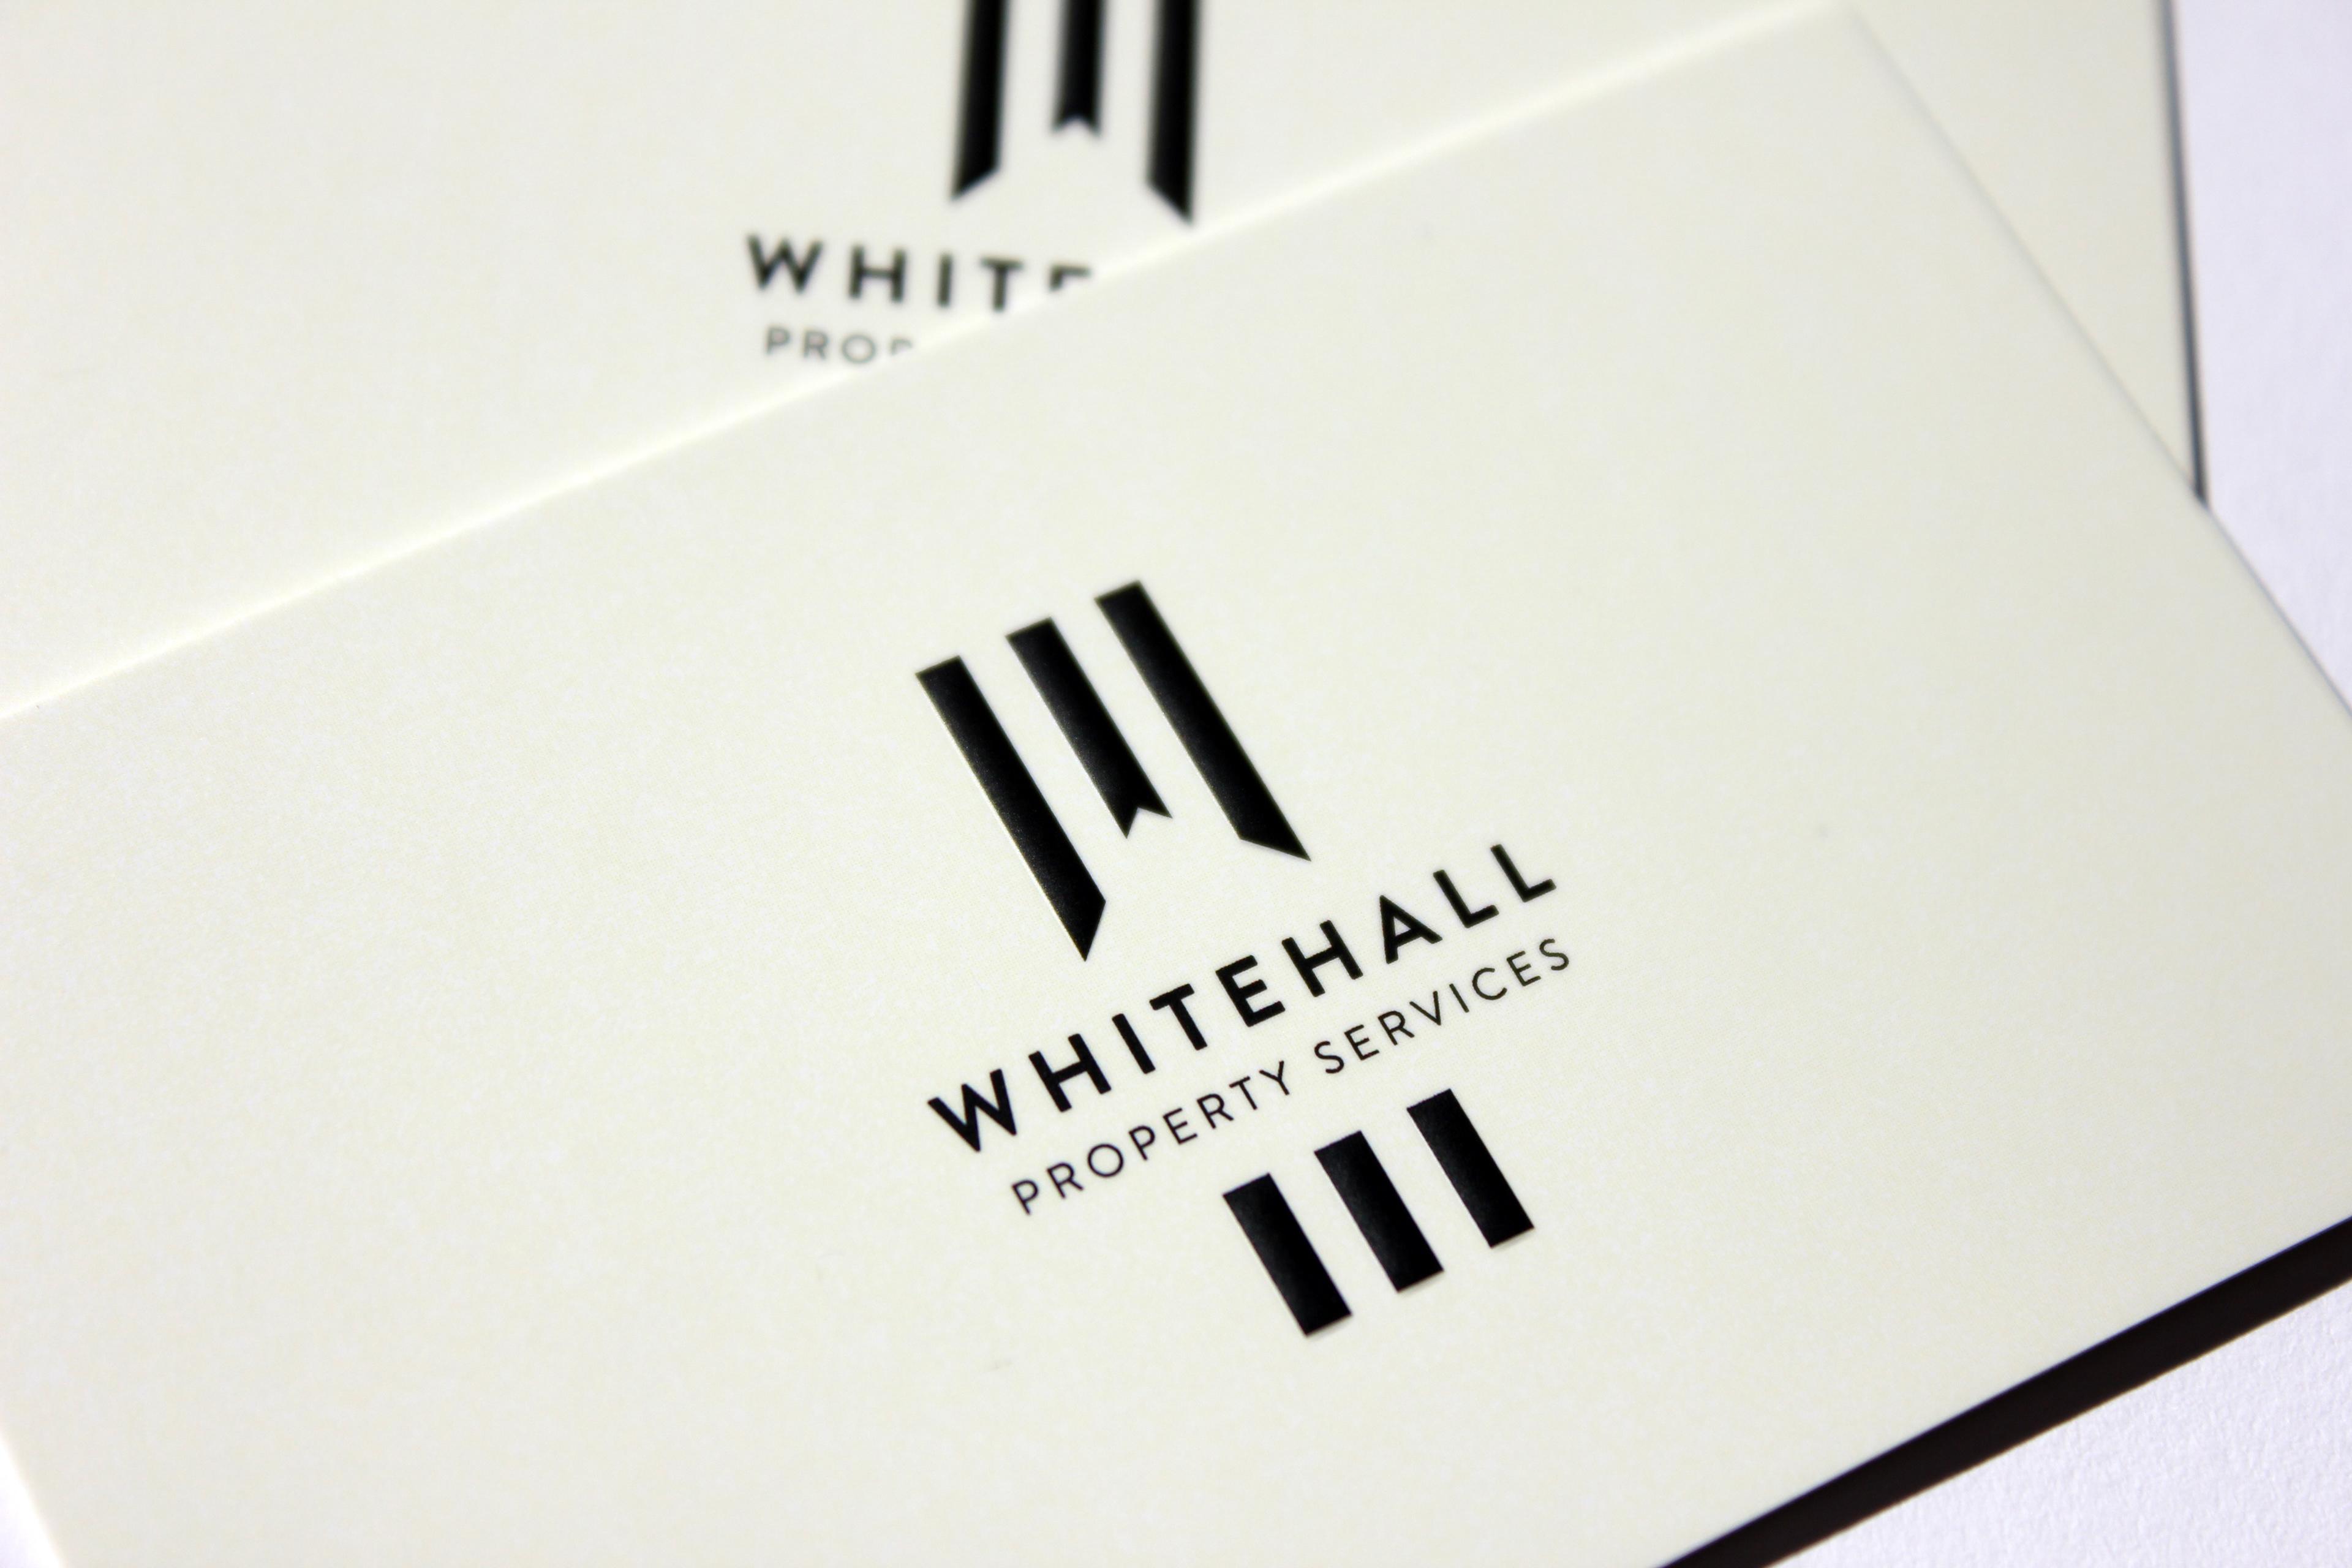 Tim Starkey - Whitehall Property Services logo / business cards